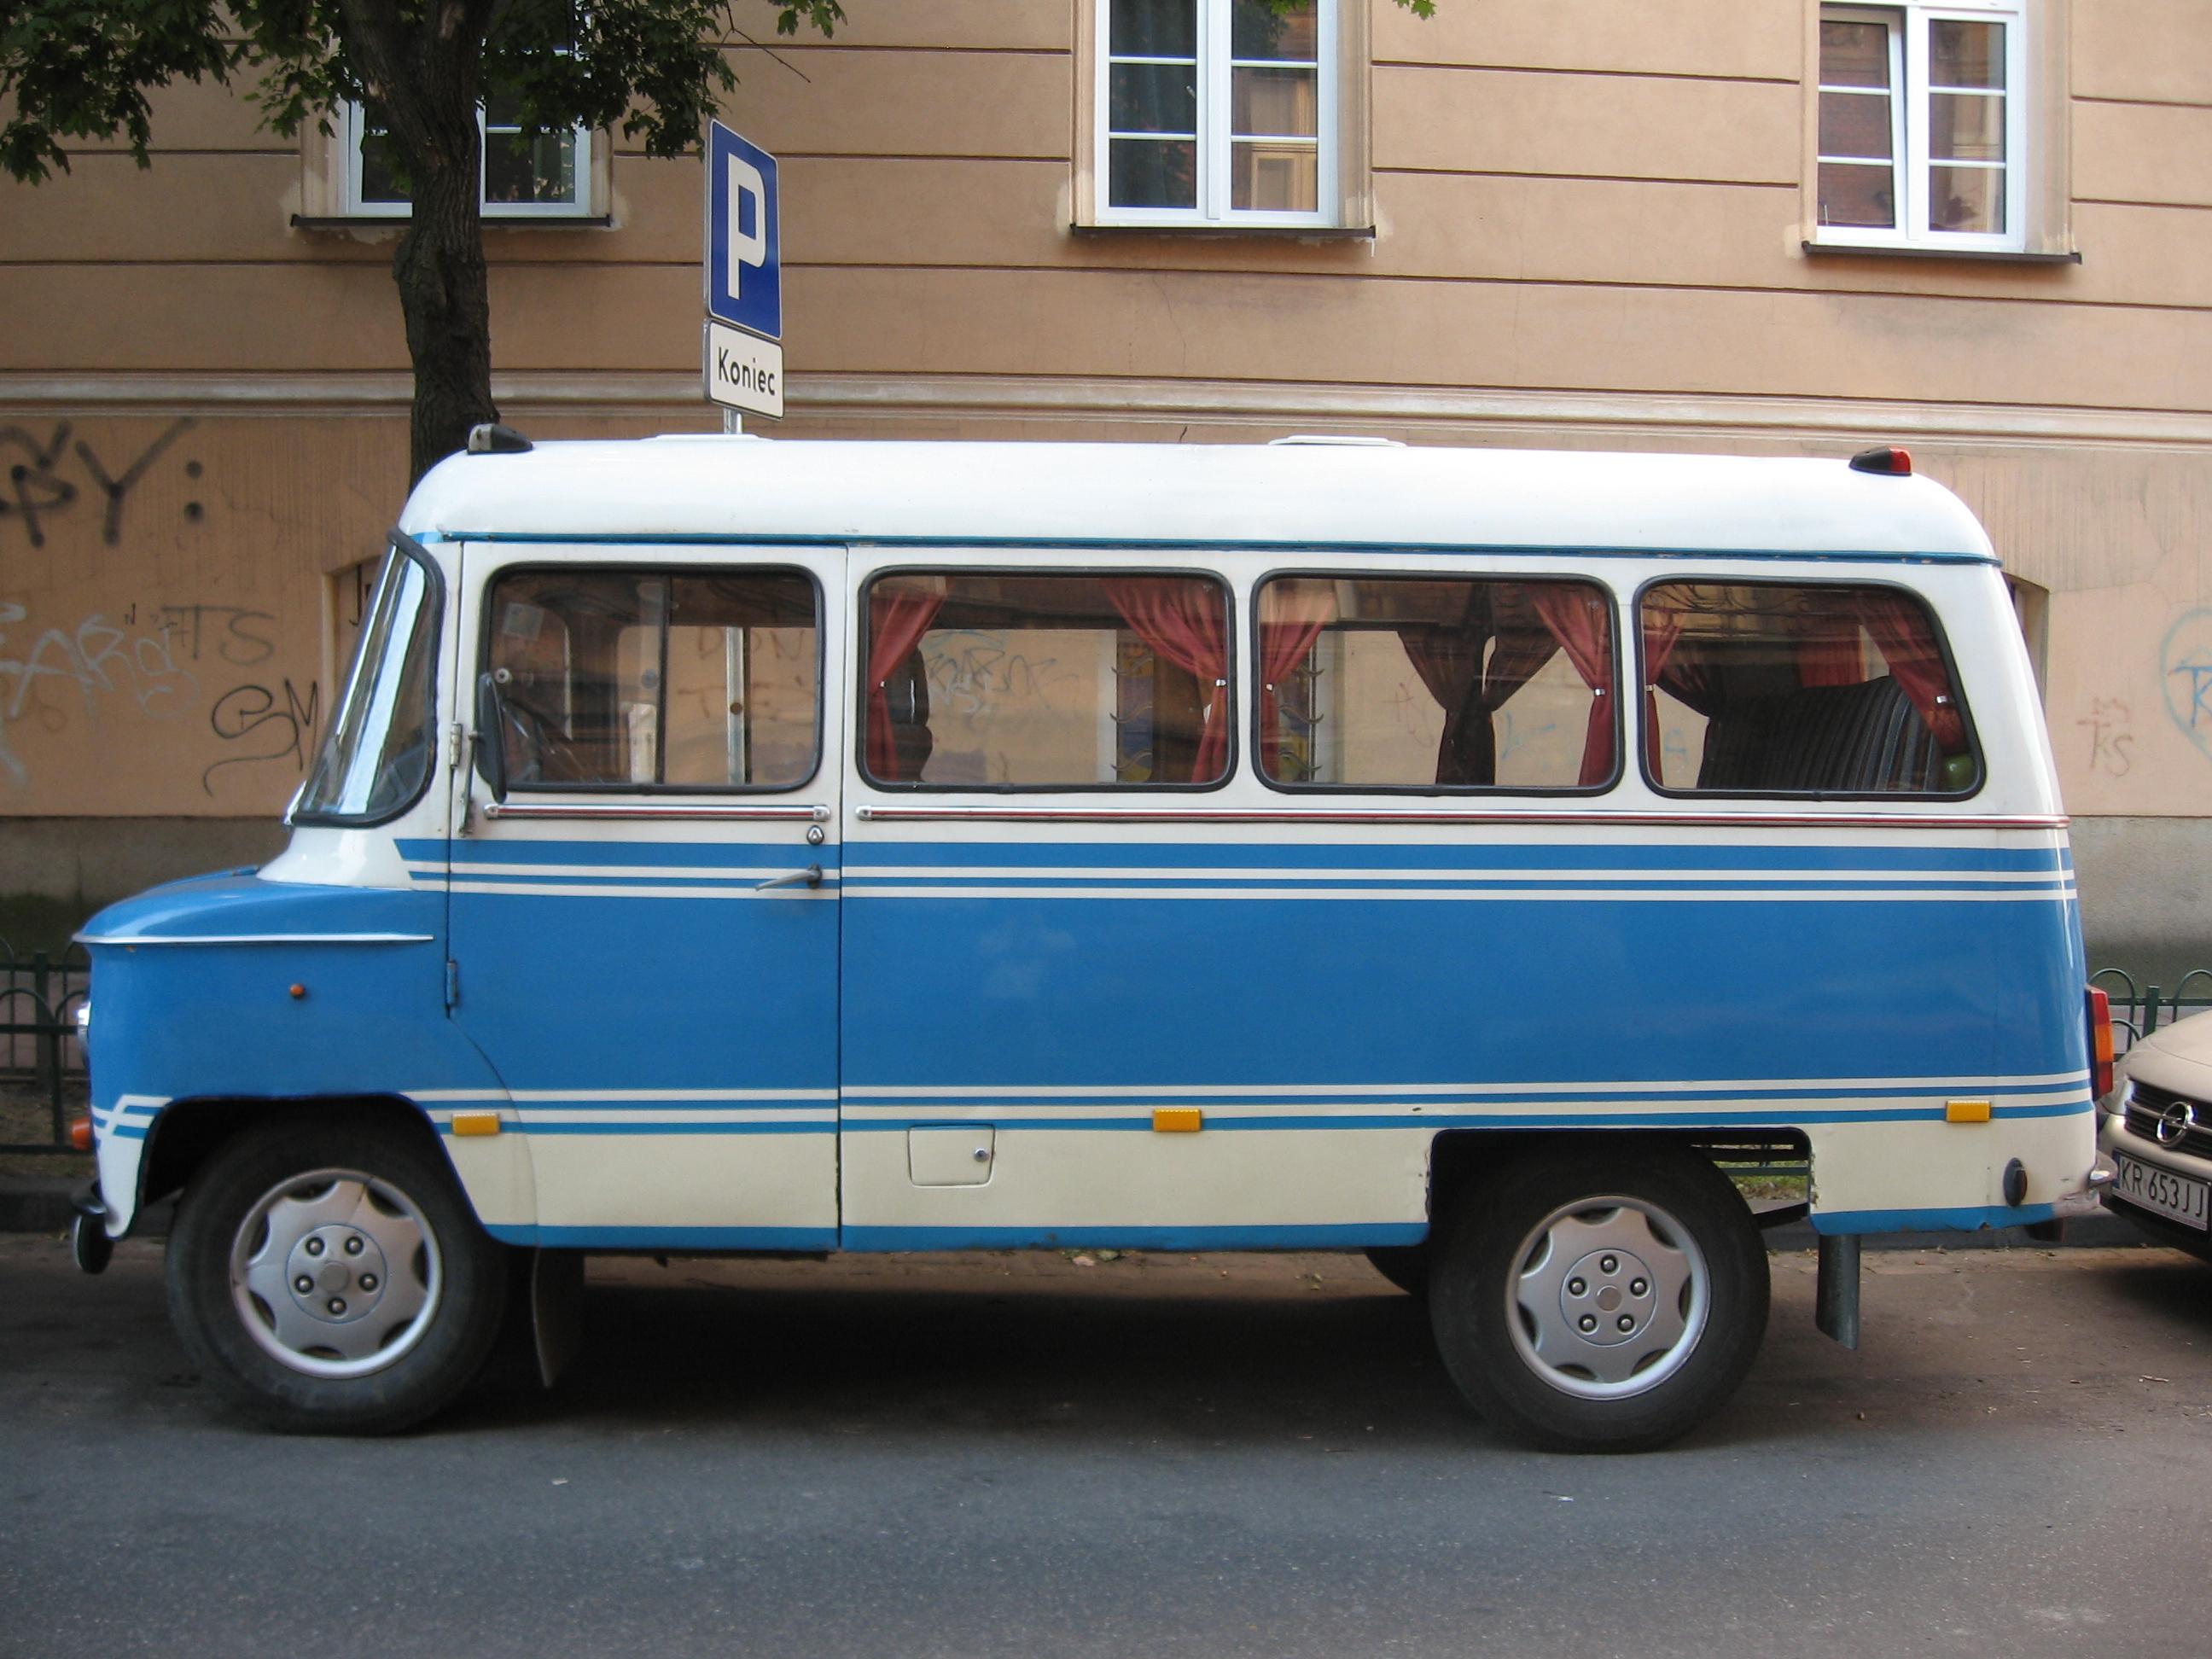 Nysa_522_on_Czapskich_street_in_Krakow_1